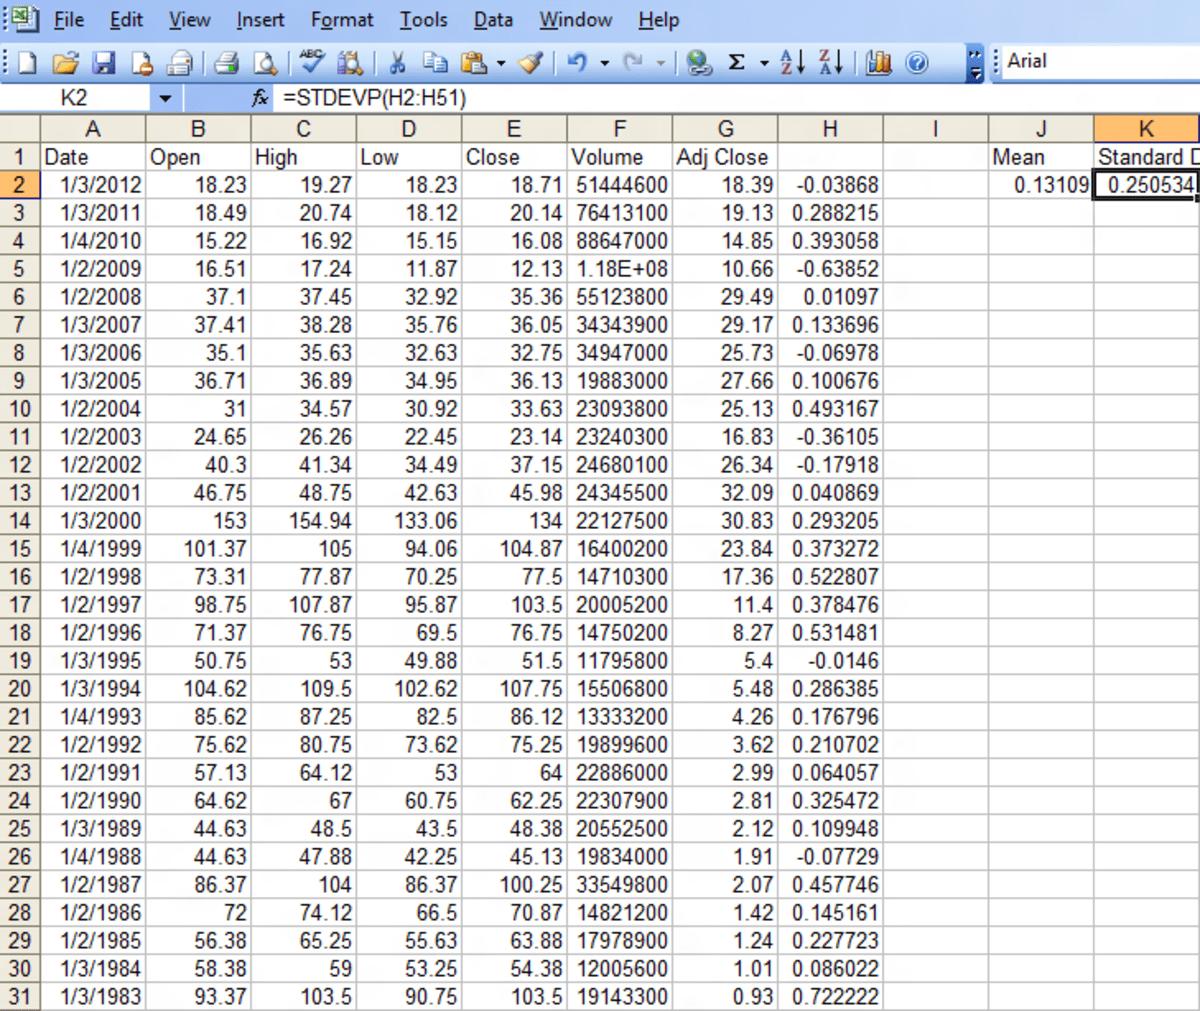 Microsoft Excel Standard Deviation Stdev Vs Stdevp